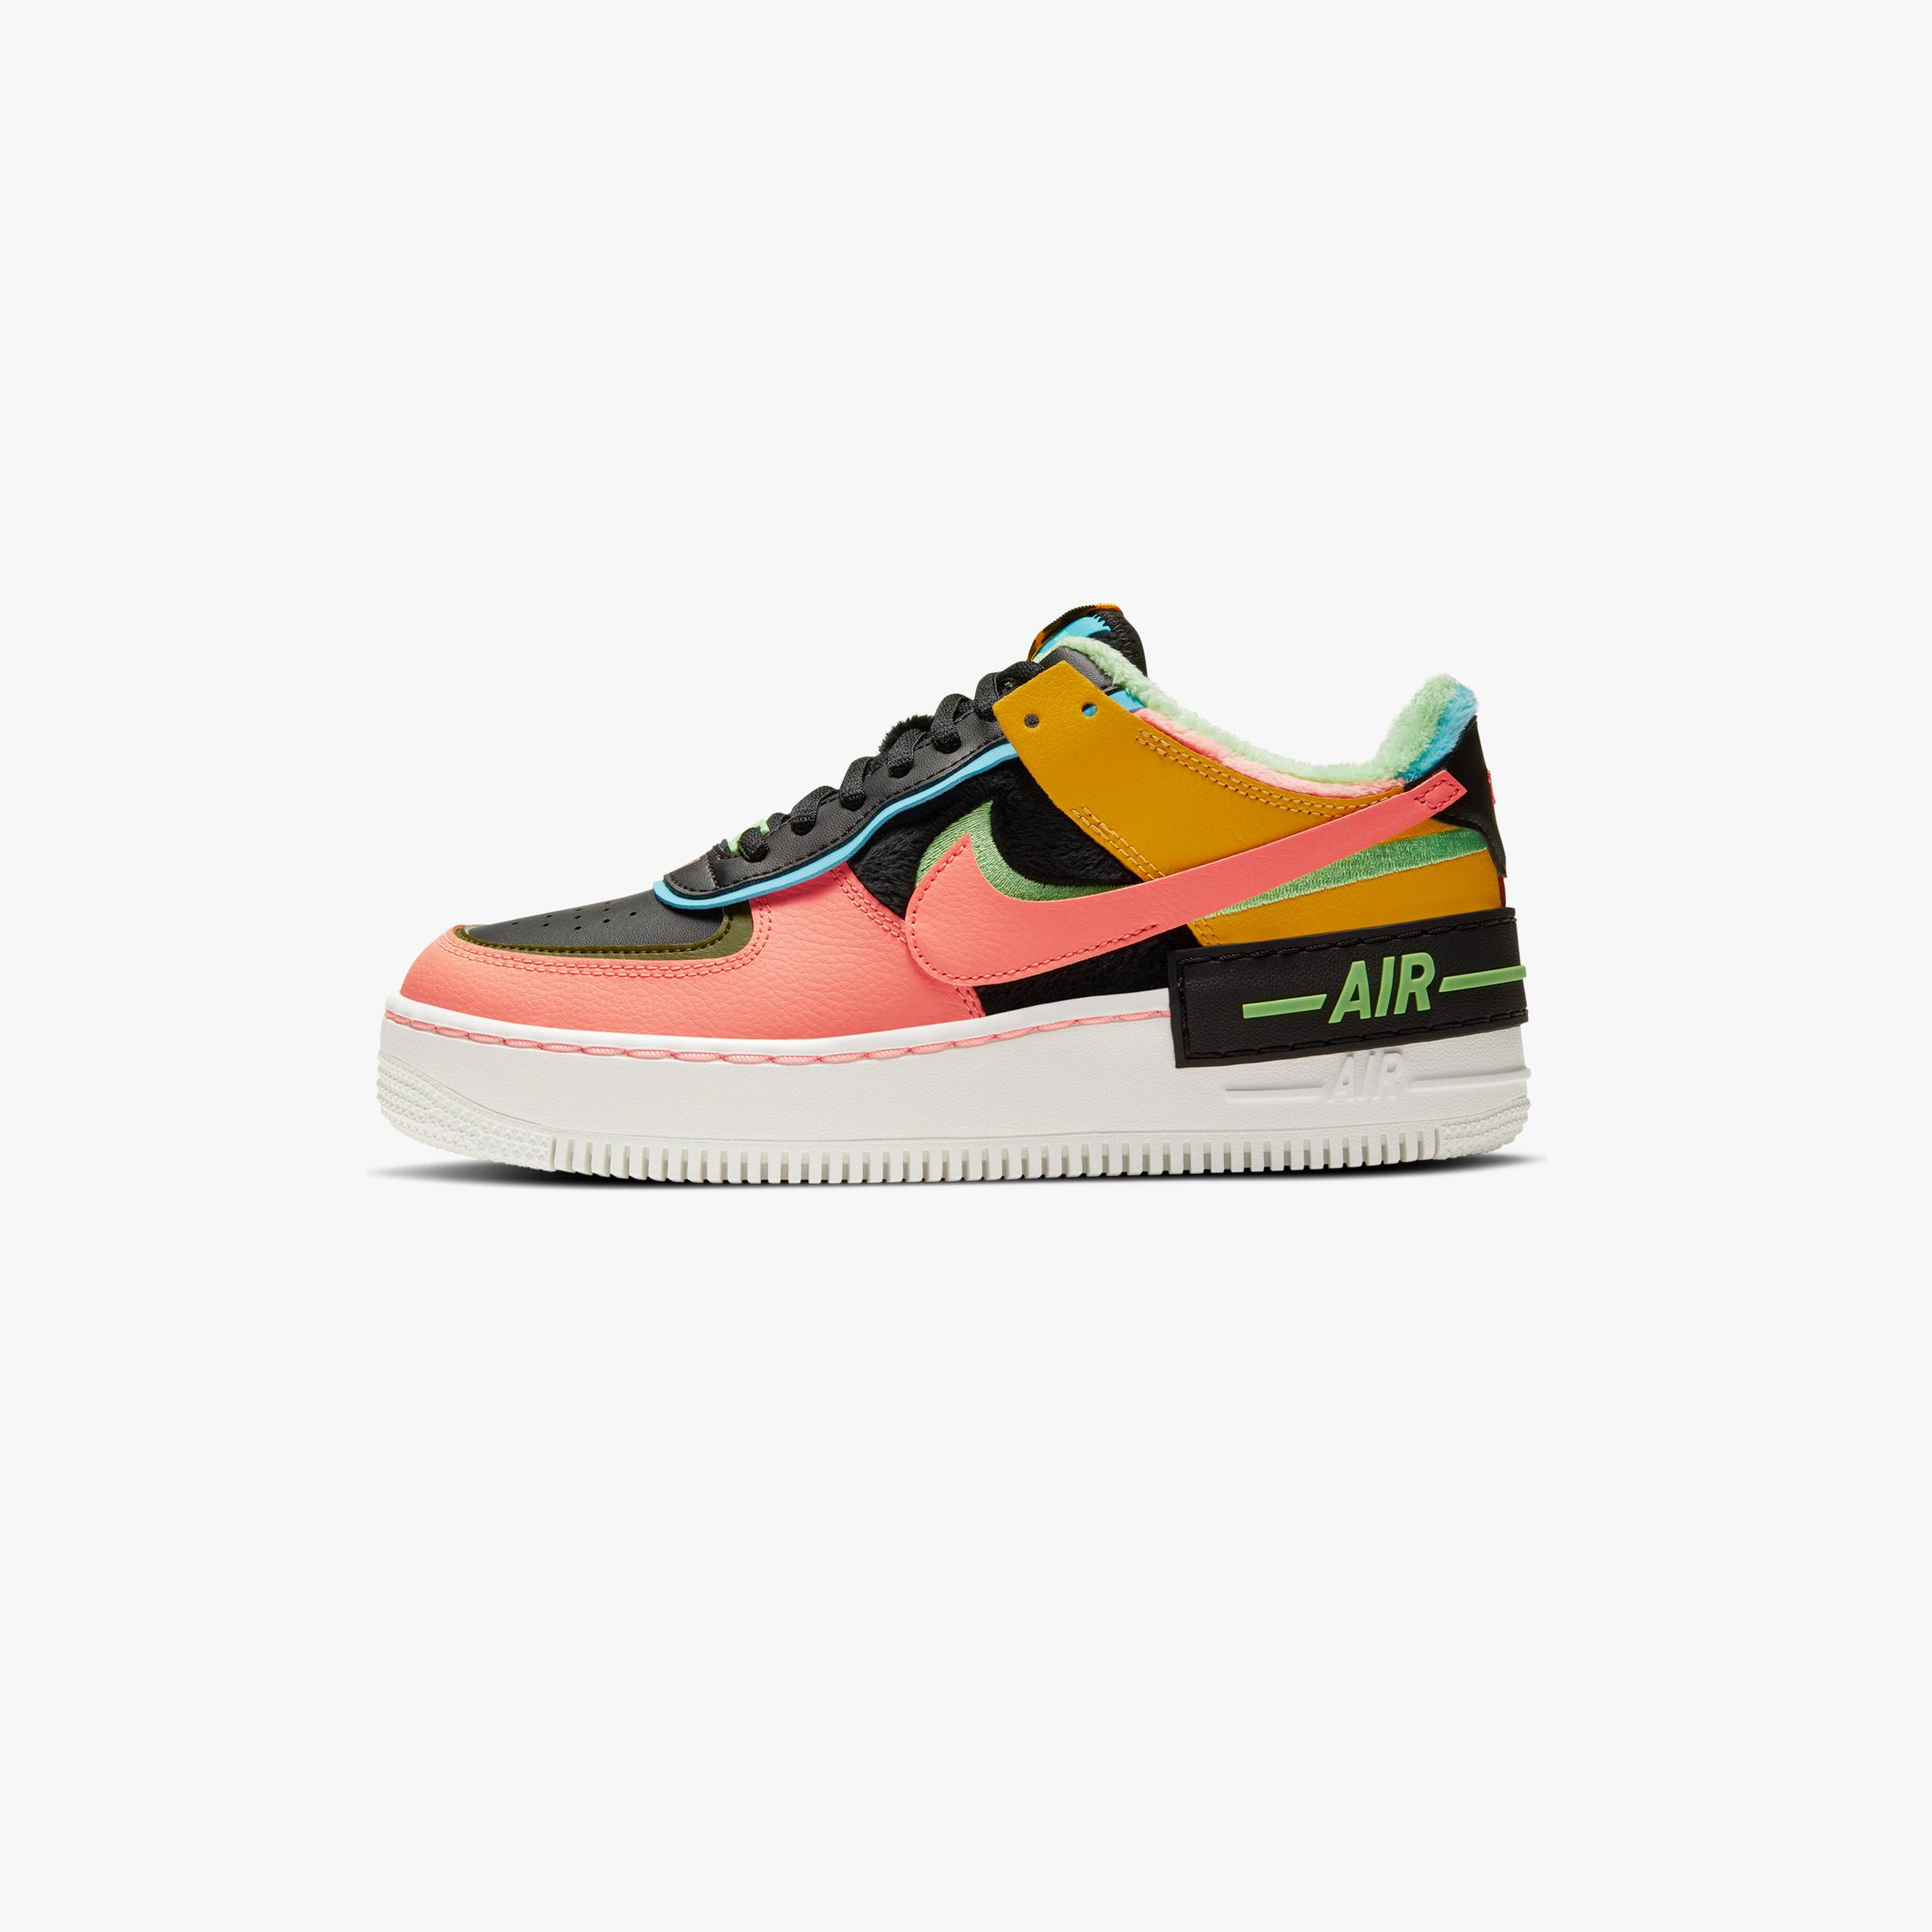 Nike Air Force 1 Shadow SE - Ct1985-700 - SNS | sneakers ...